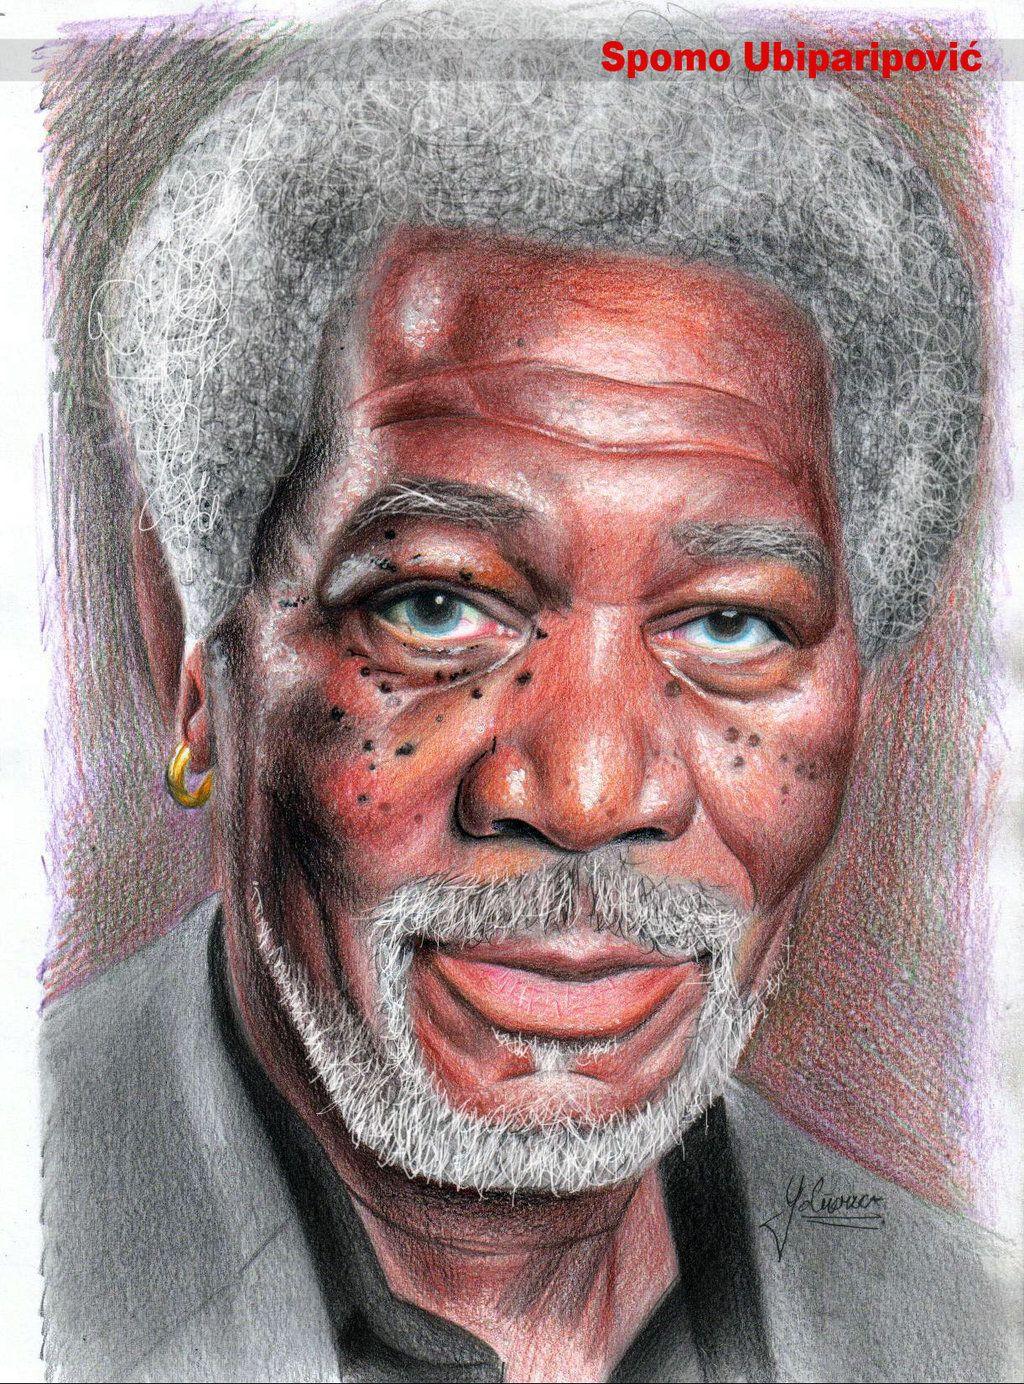 morgan freeman by spomo u on deviantart colored pencil art by spomenko ubiparipovic